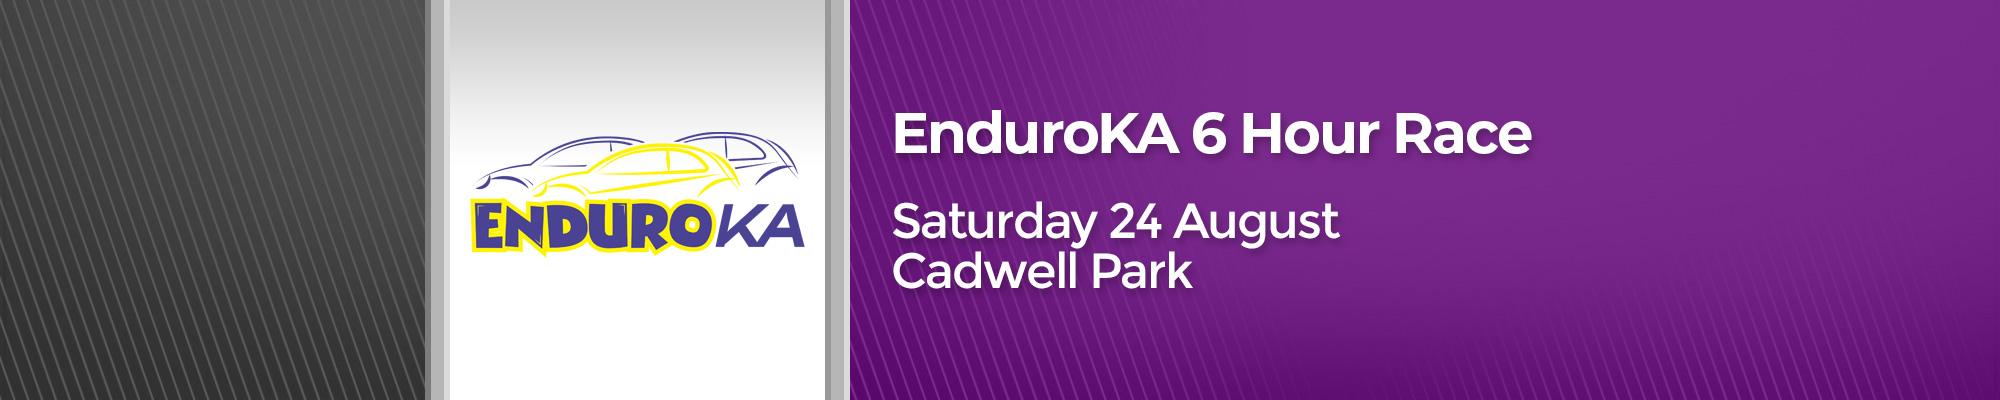 EnduroKA 6 Hour Race